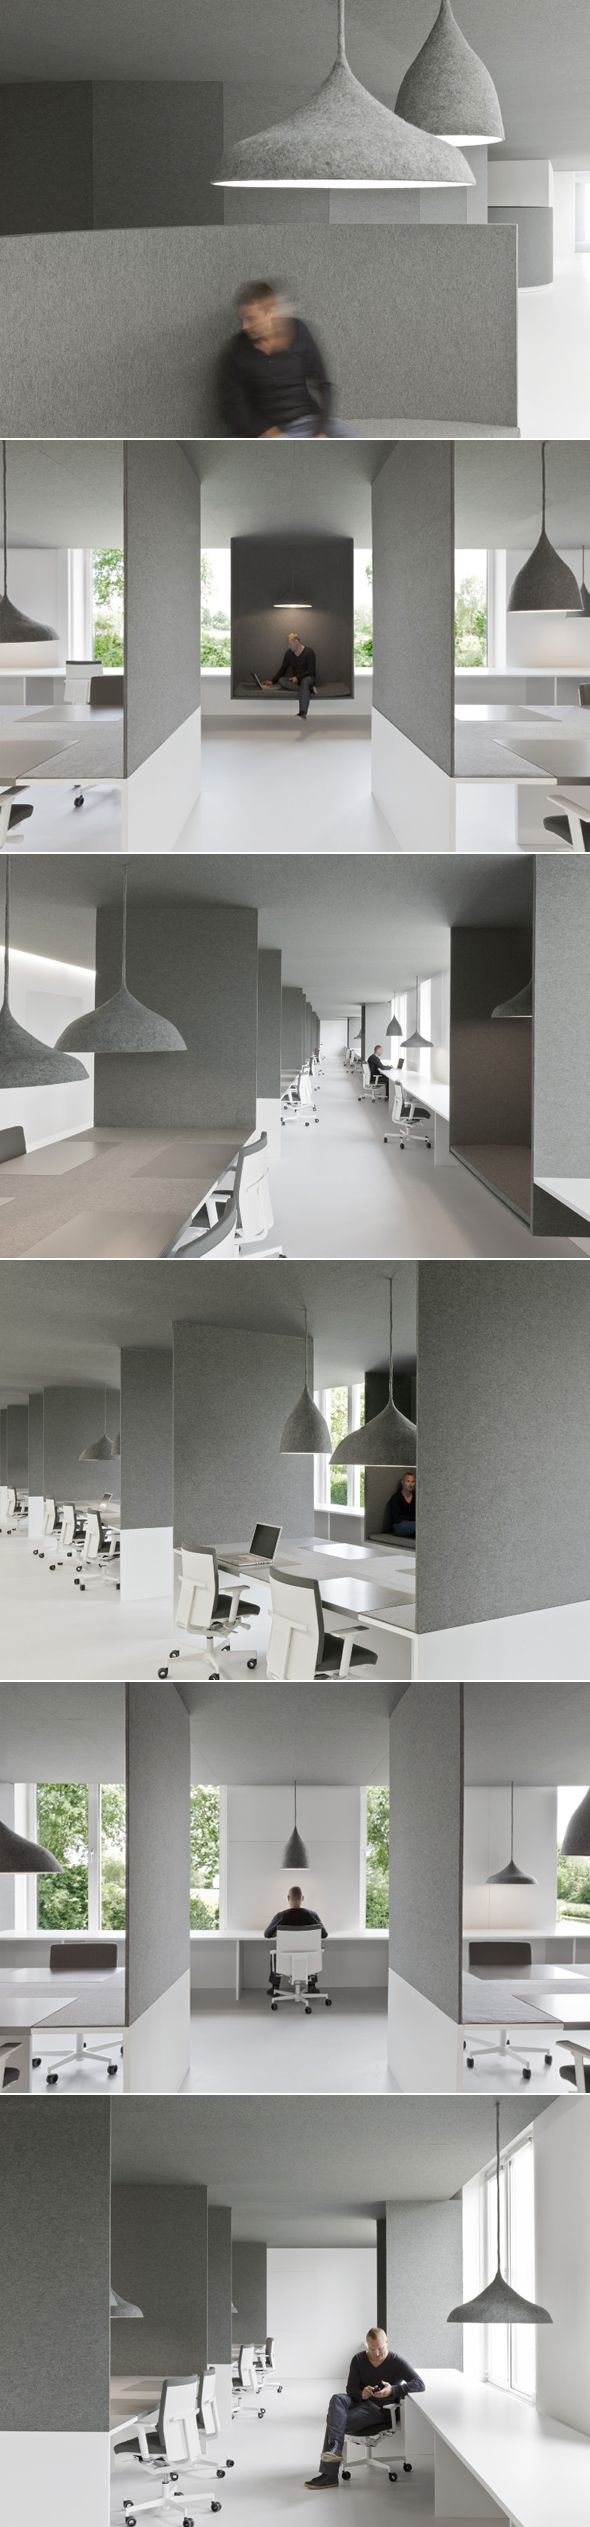 OFFICE 04 par i29 | interior architects